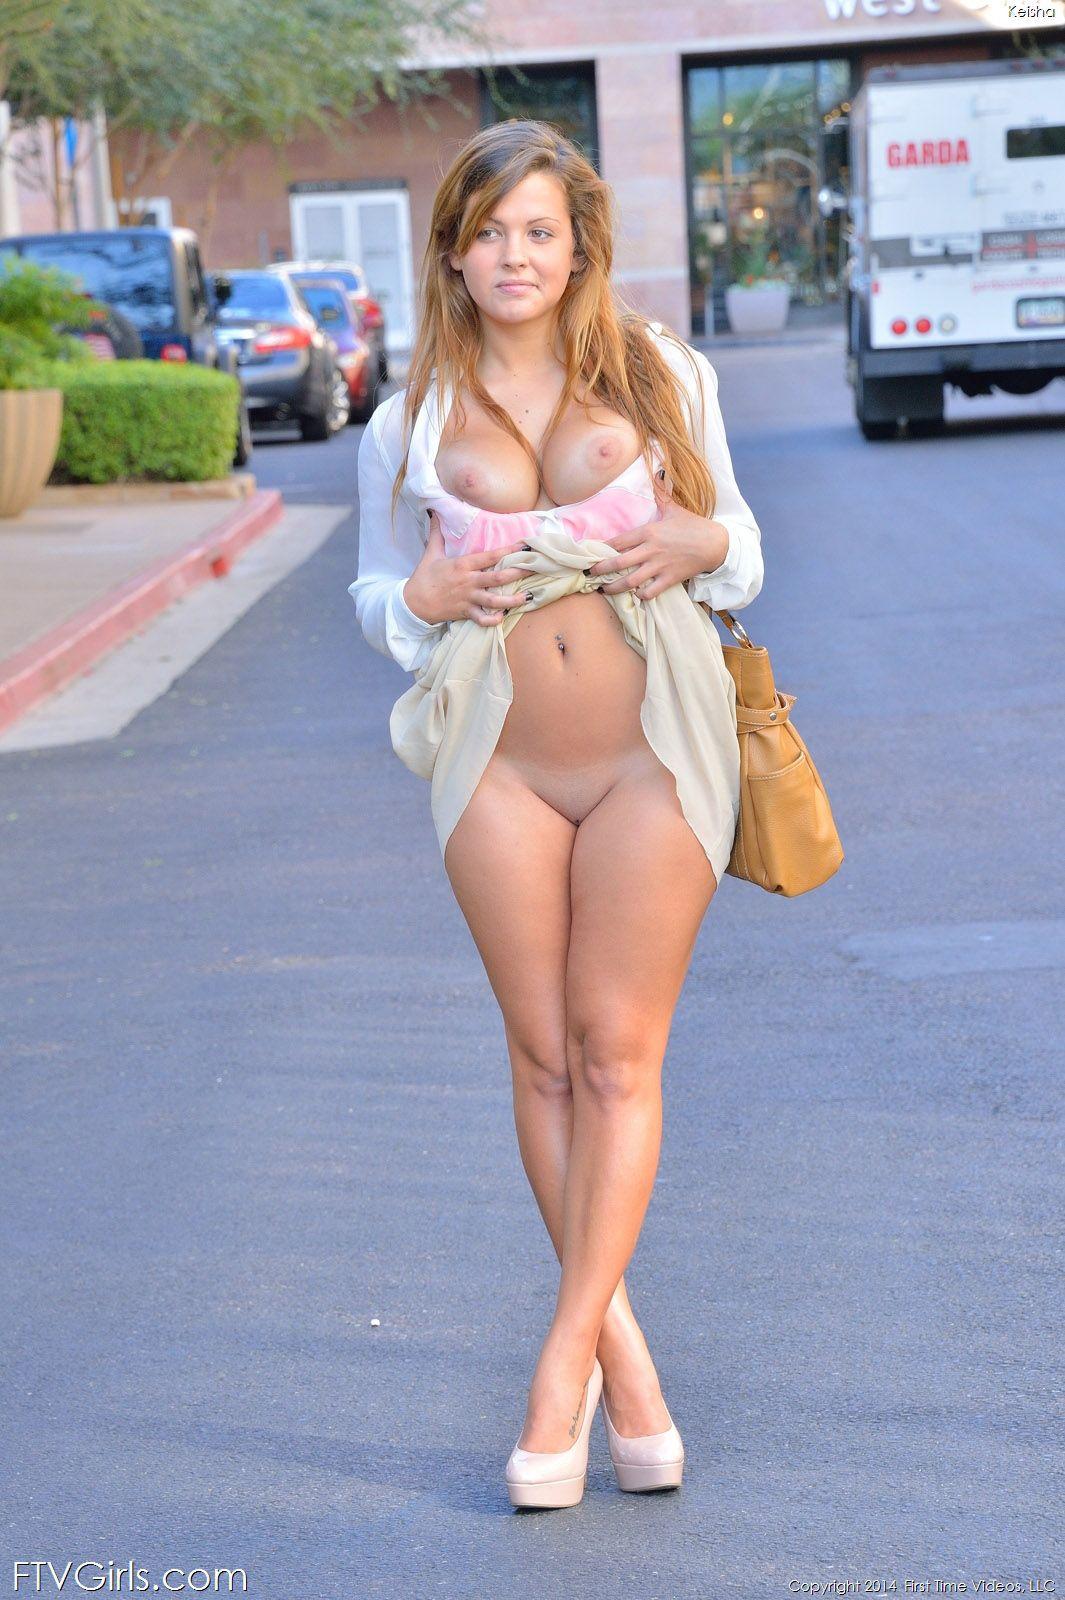 Mimi rogers nude full body massage 6